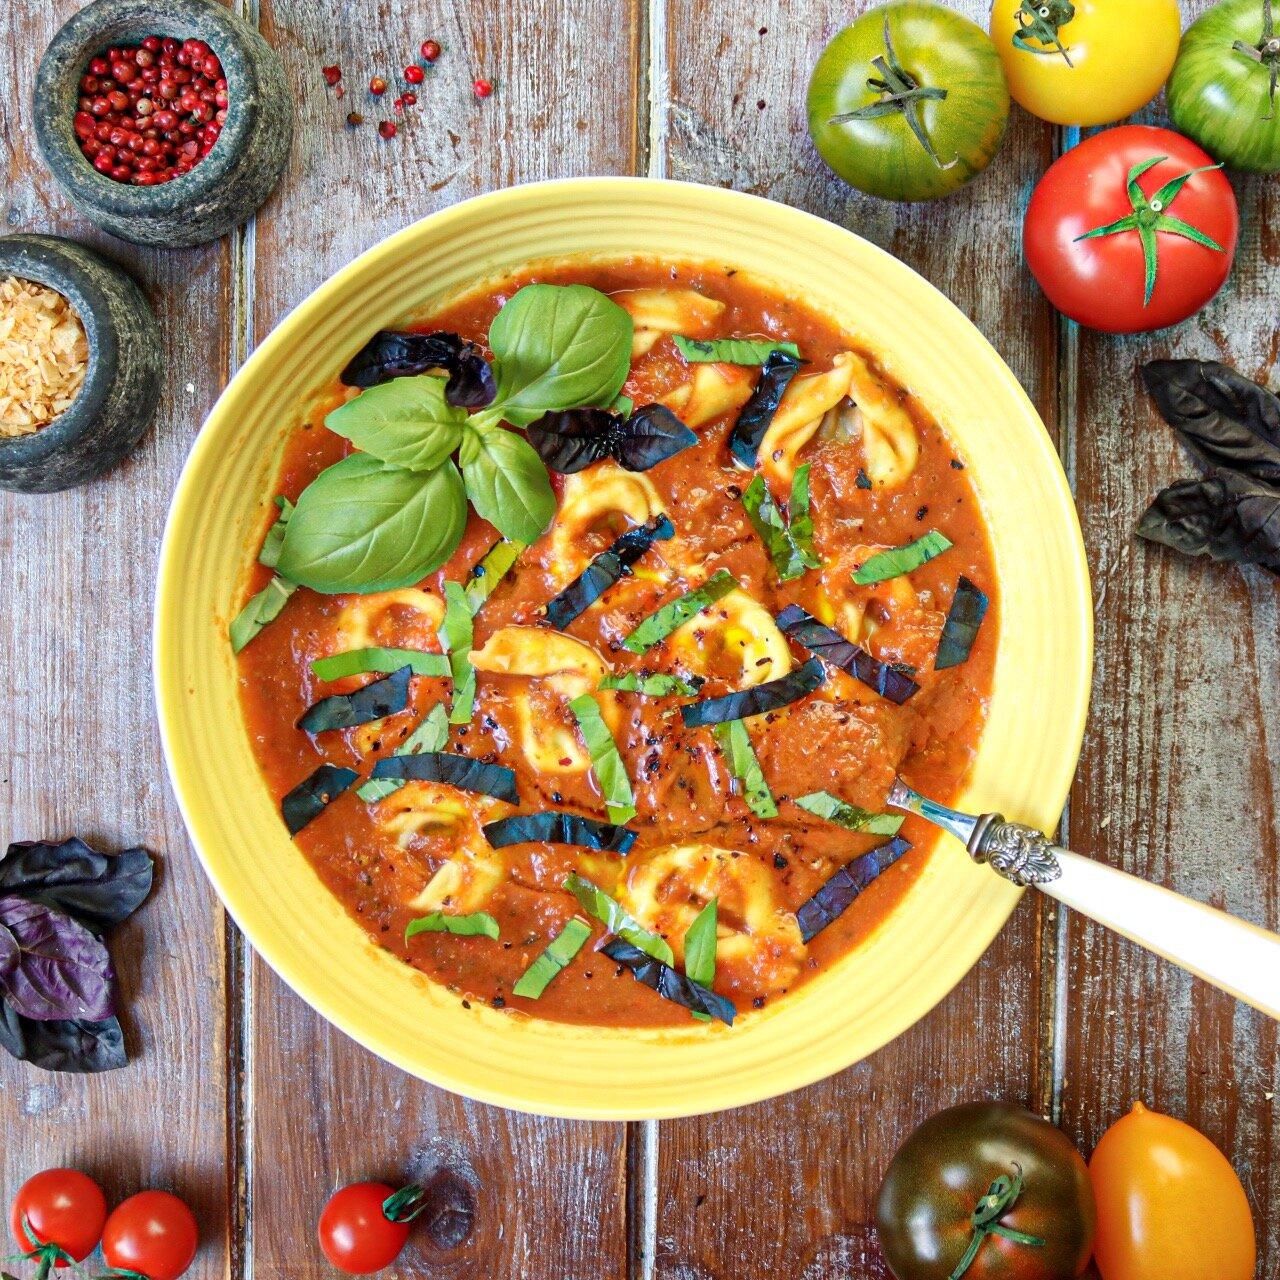 'Cream' of Tomato Tortellini Soup.